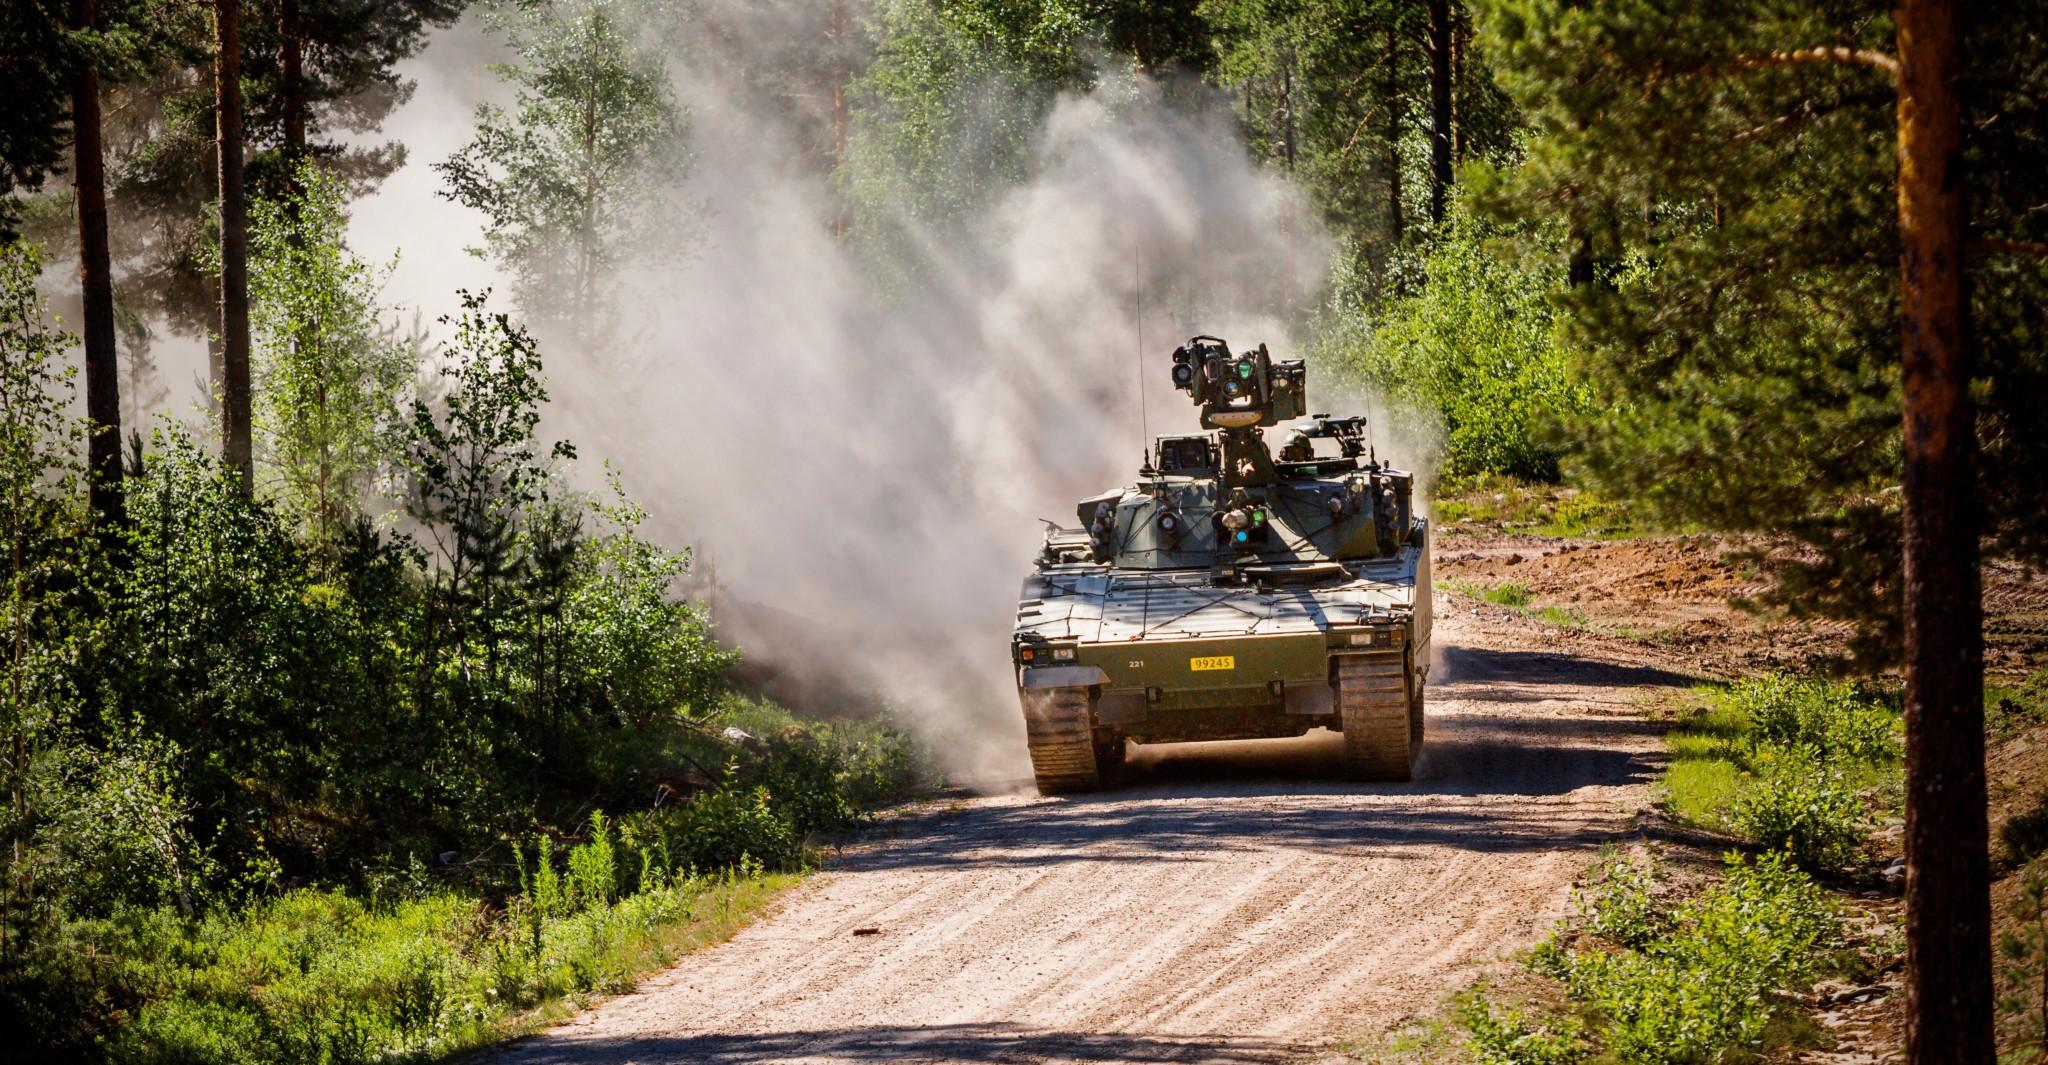 Gummibeltene på CV90 ryker hyppig